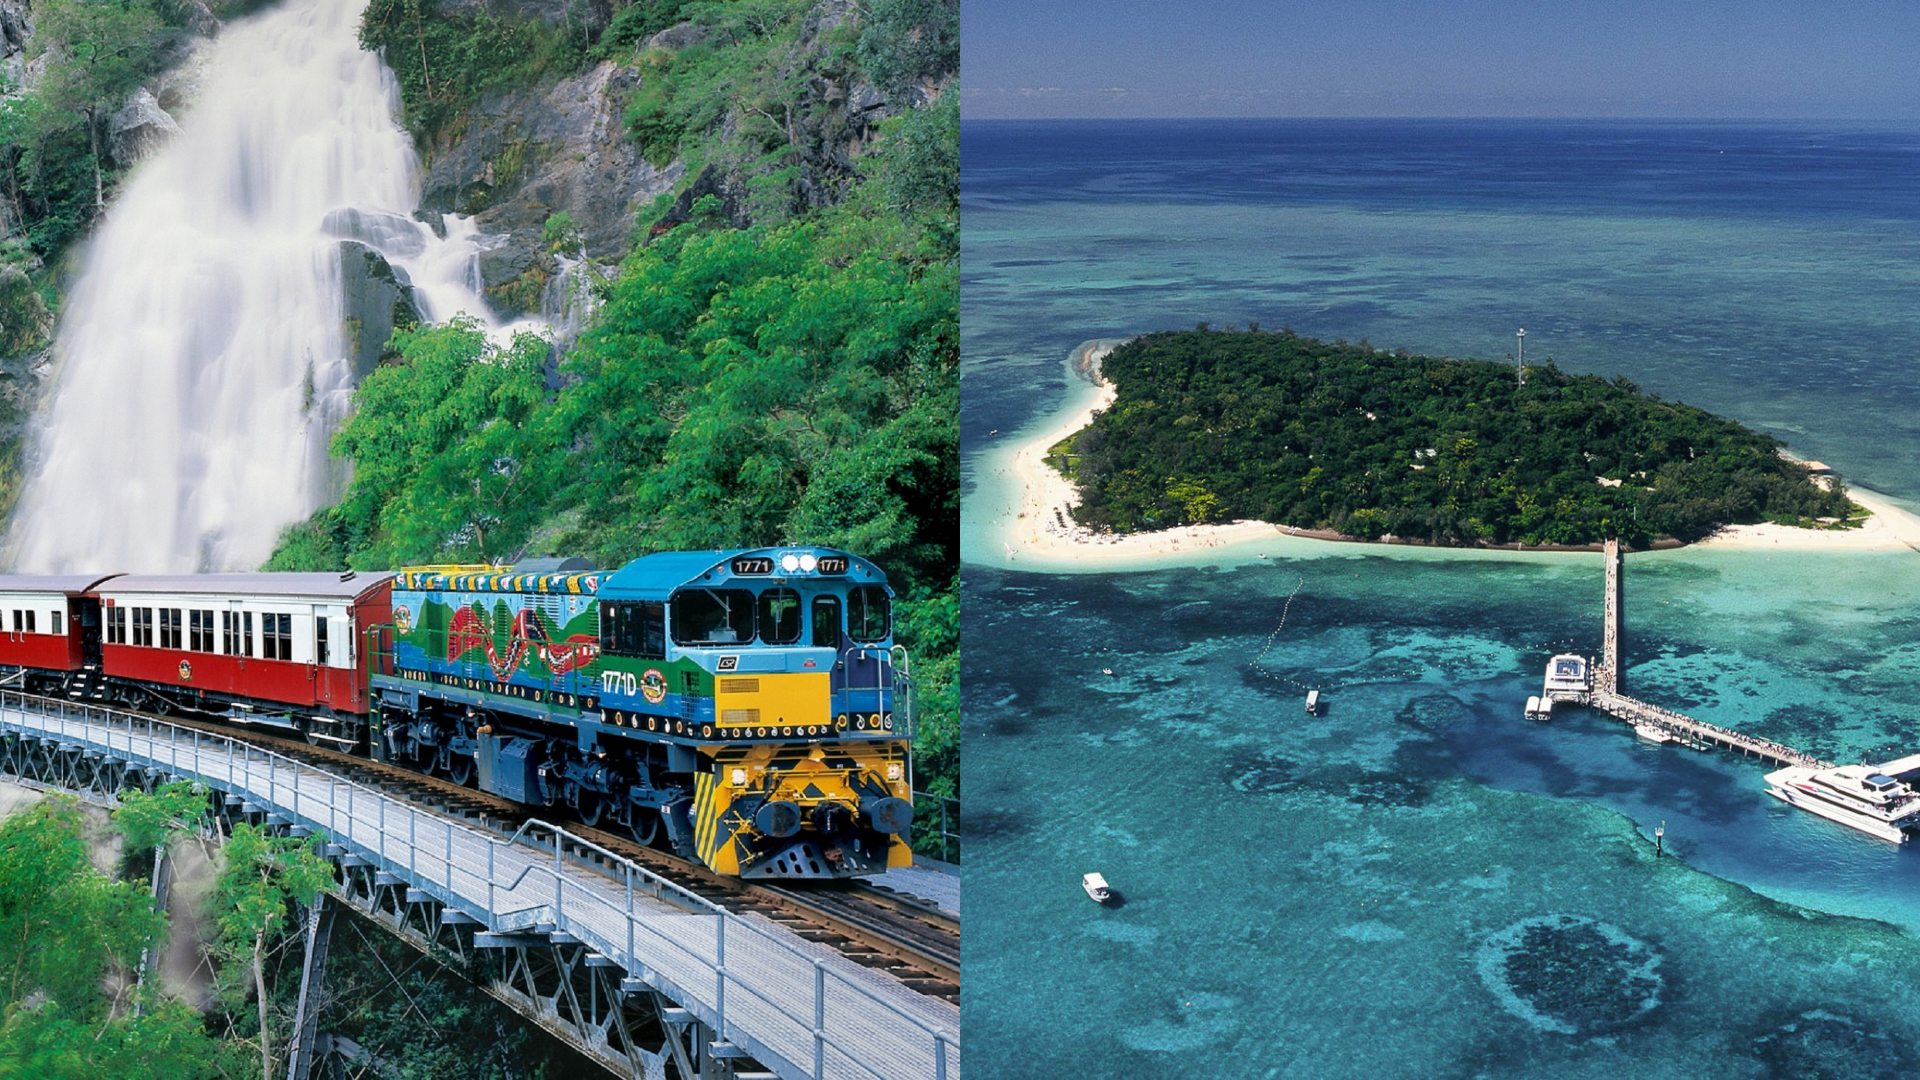 Kuranda (Skyrail & Train) + Green Island – 2 Day Package